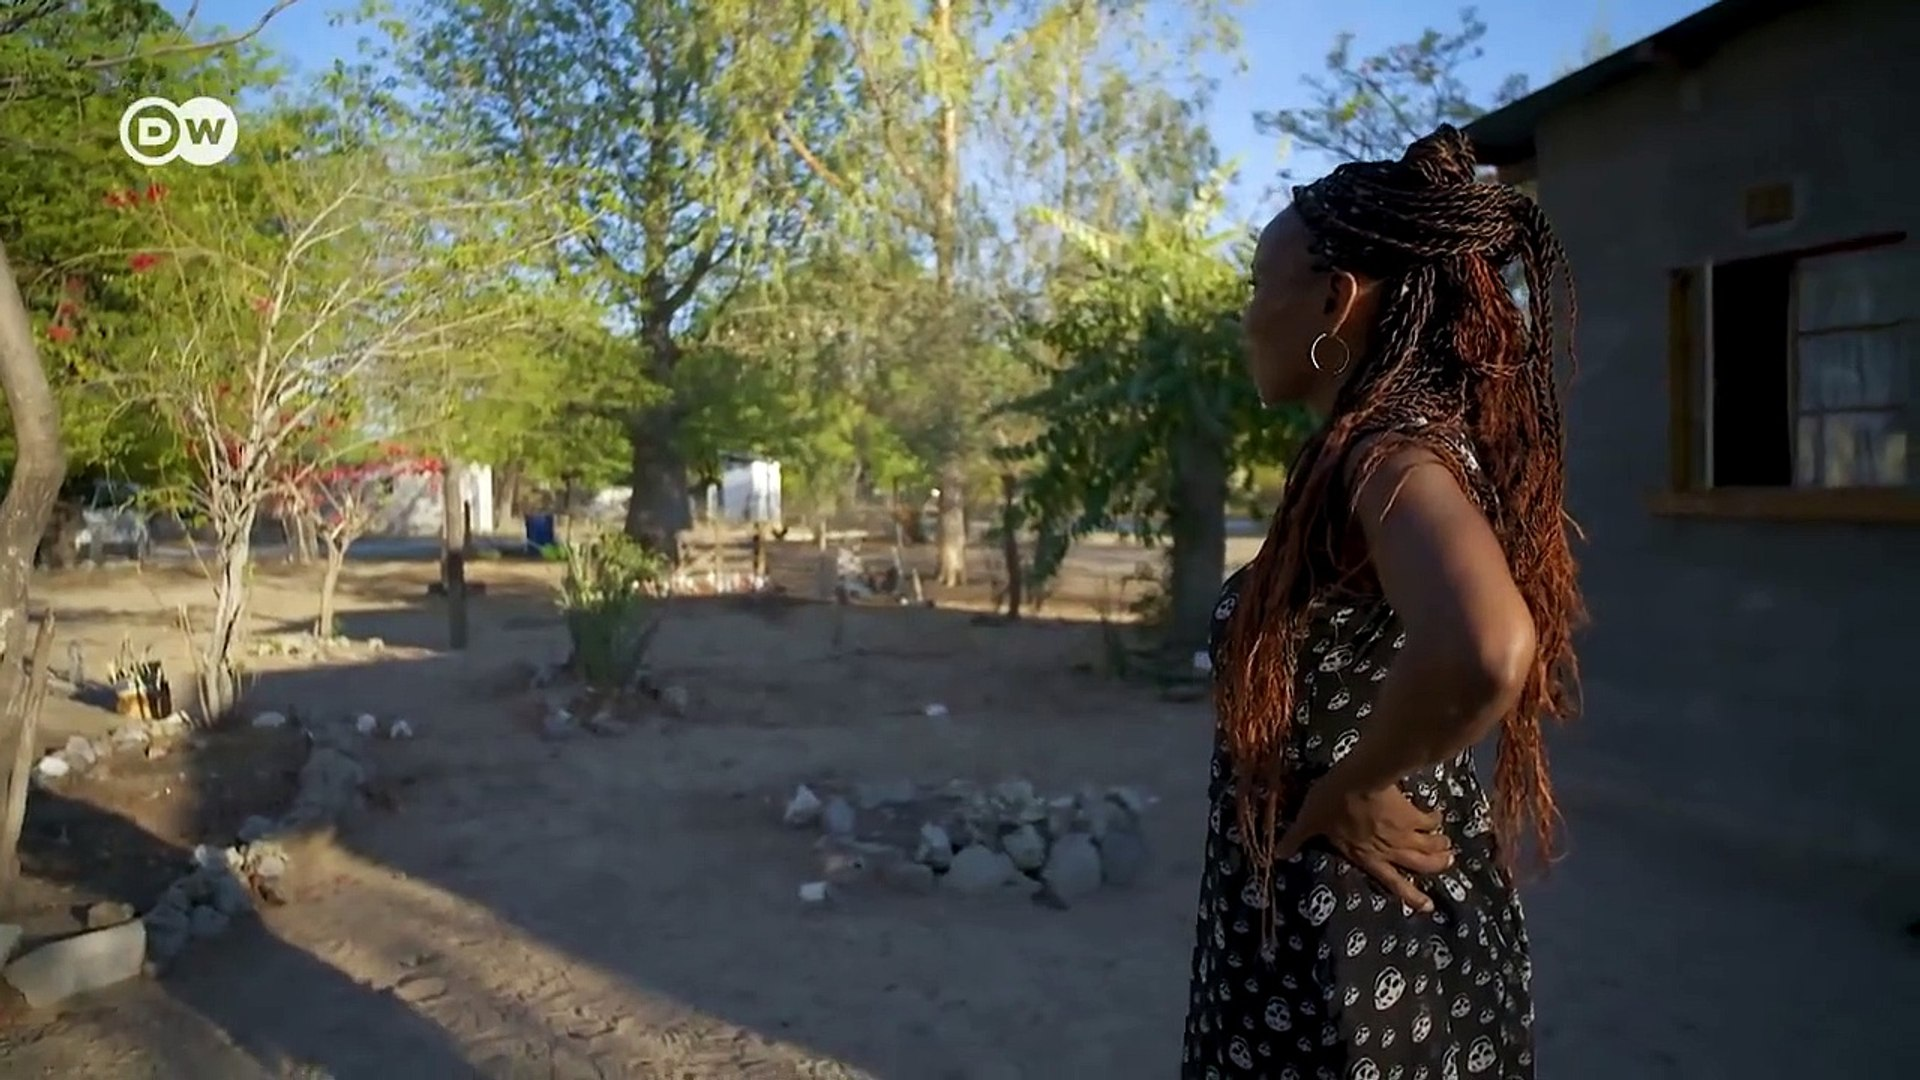 Africa - Rocker ladies in Botswana  (African Documentary)